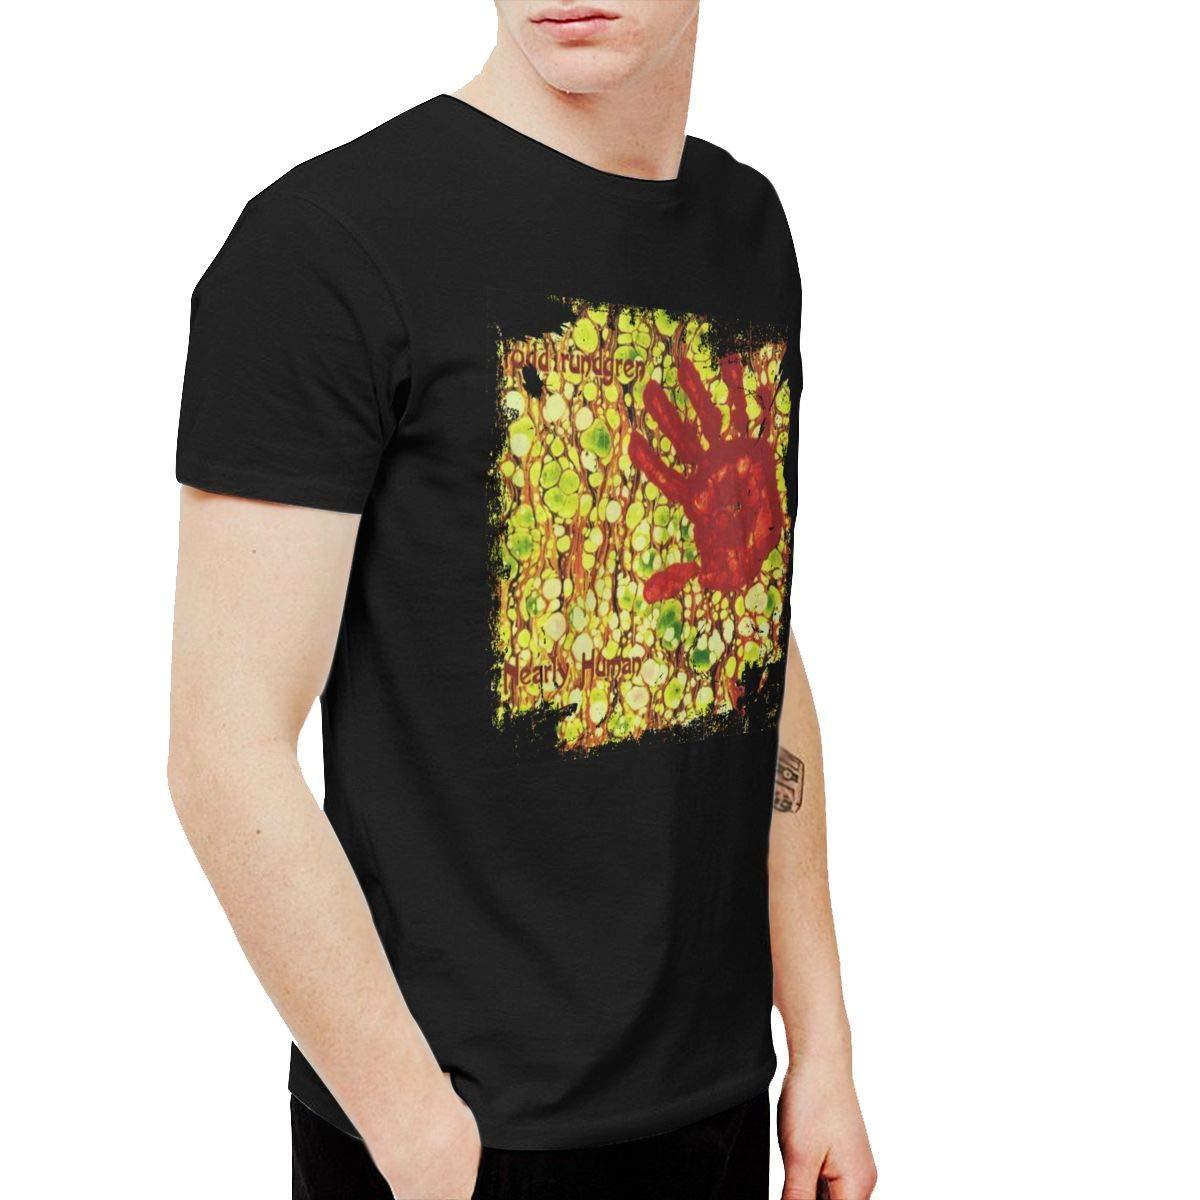 XLBSFJIWVD Todd Rundgren Nearly Human Mens Short Sleeve T-Shirt Black